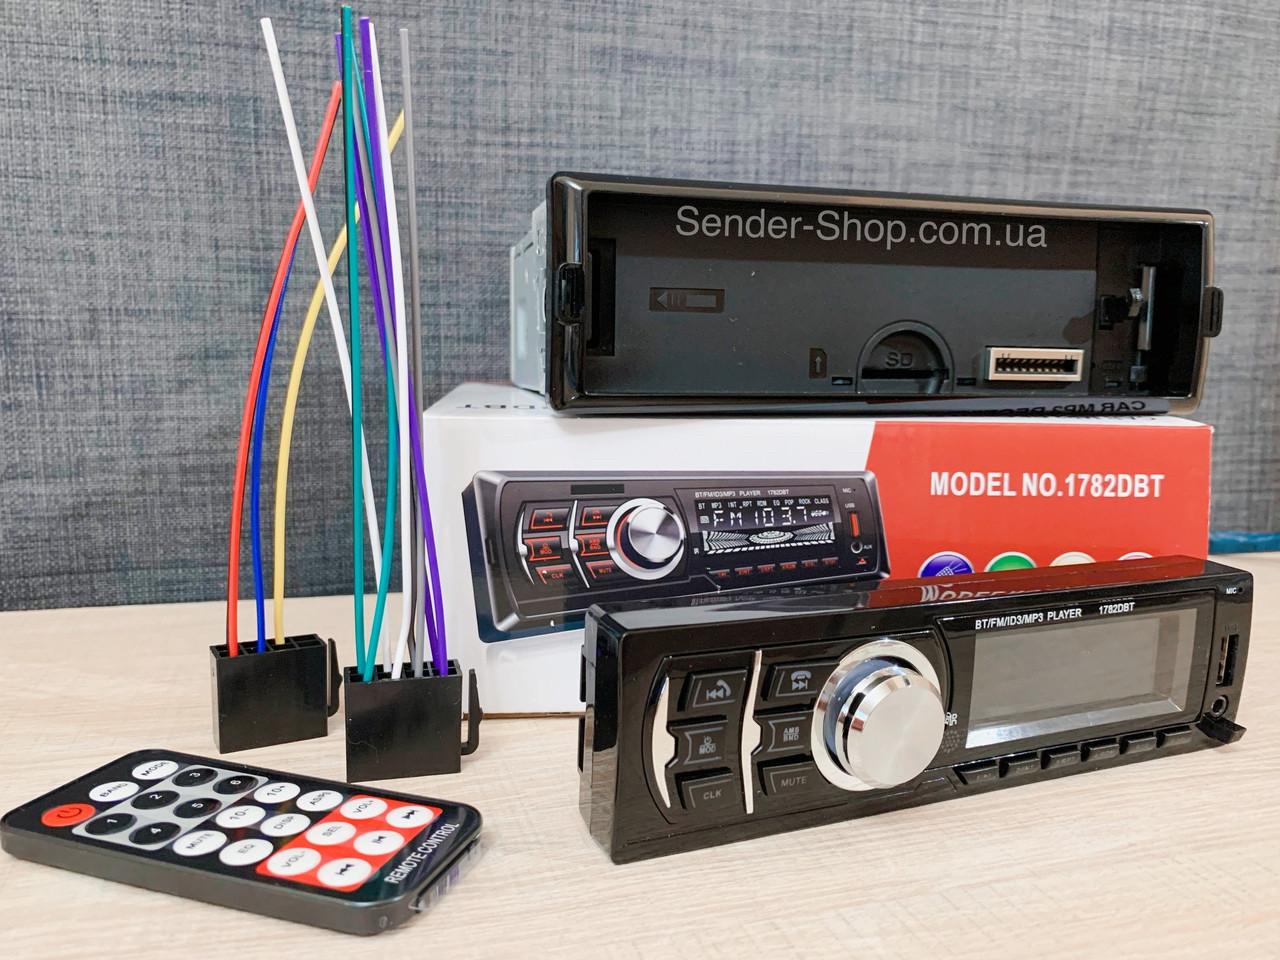 Автомагнитола съёмная панель Блютуз 1DIN USB Bluetooth AUX micro SD